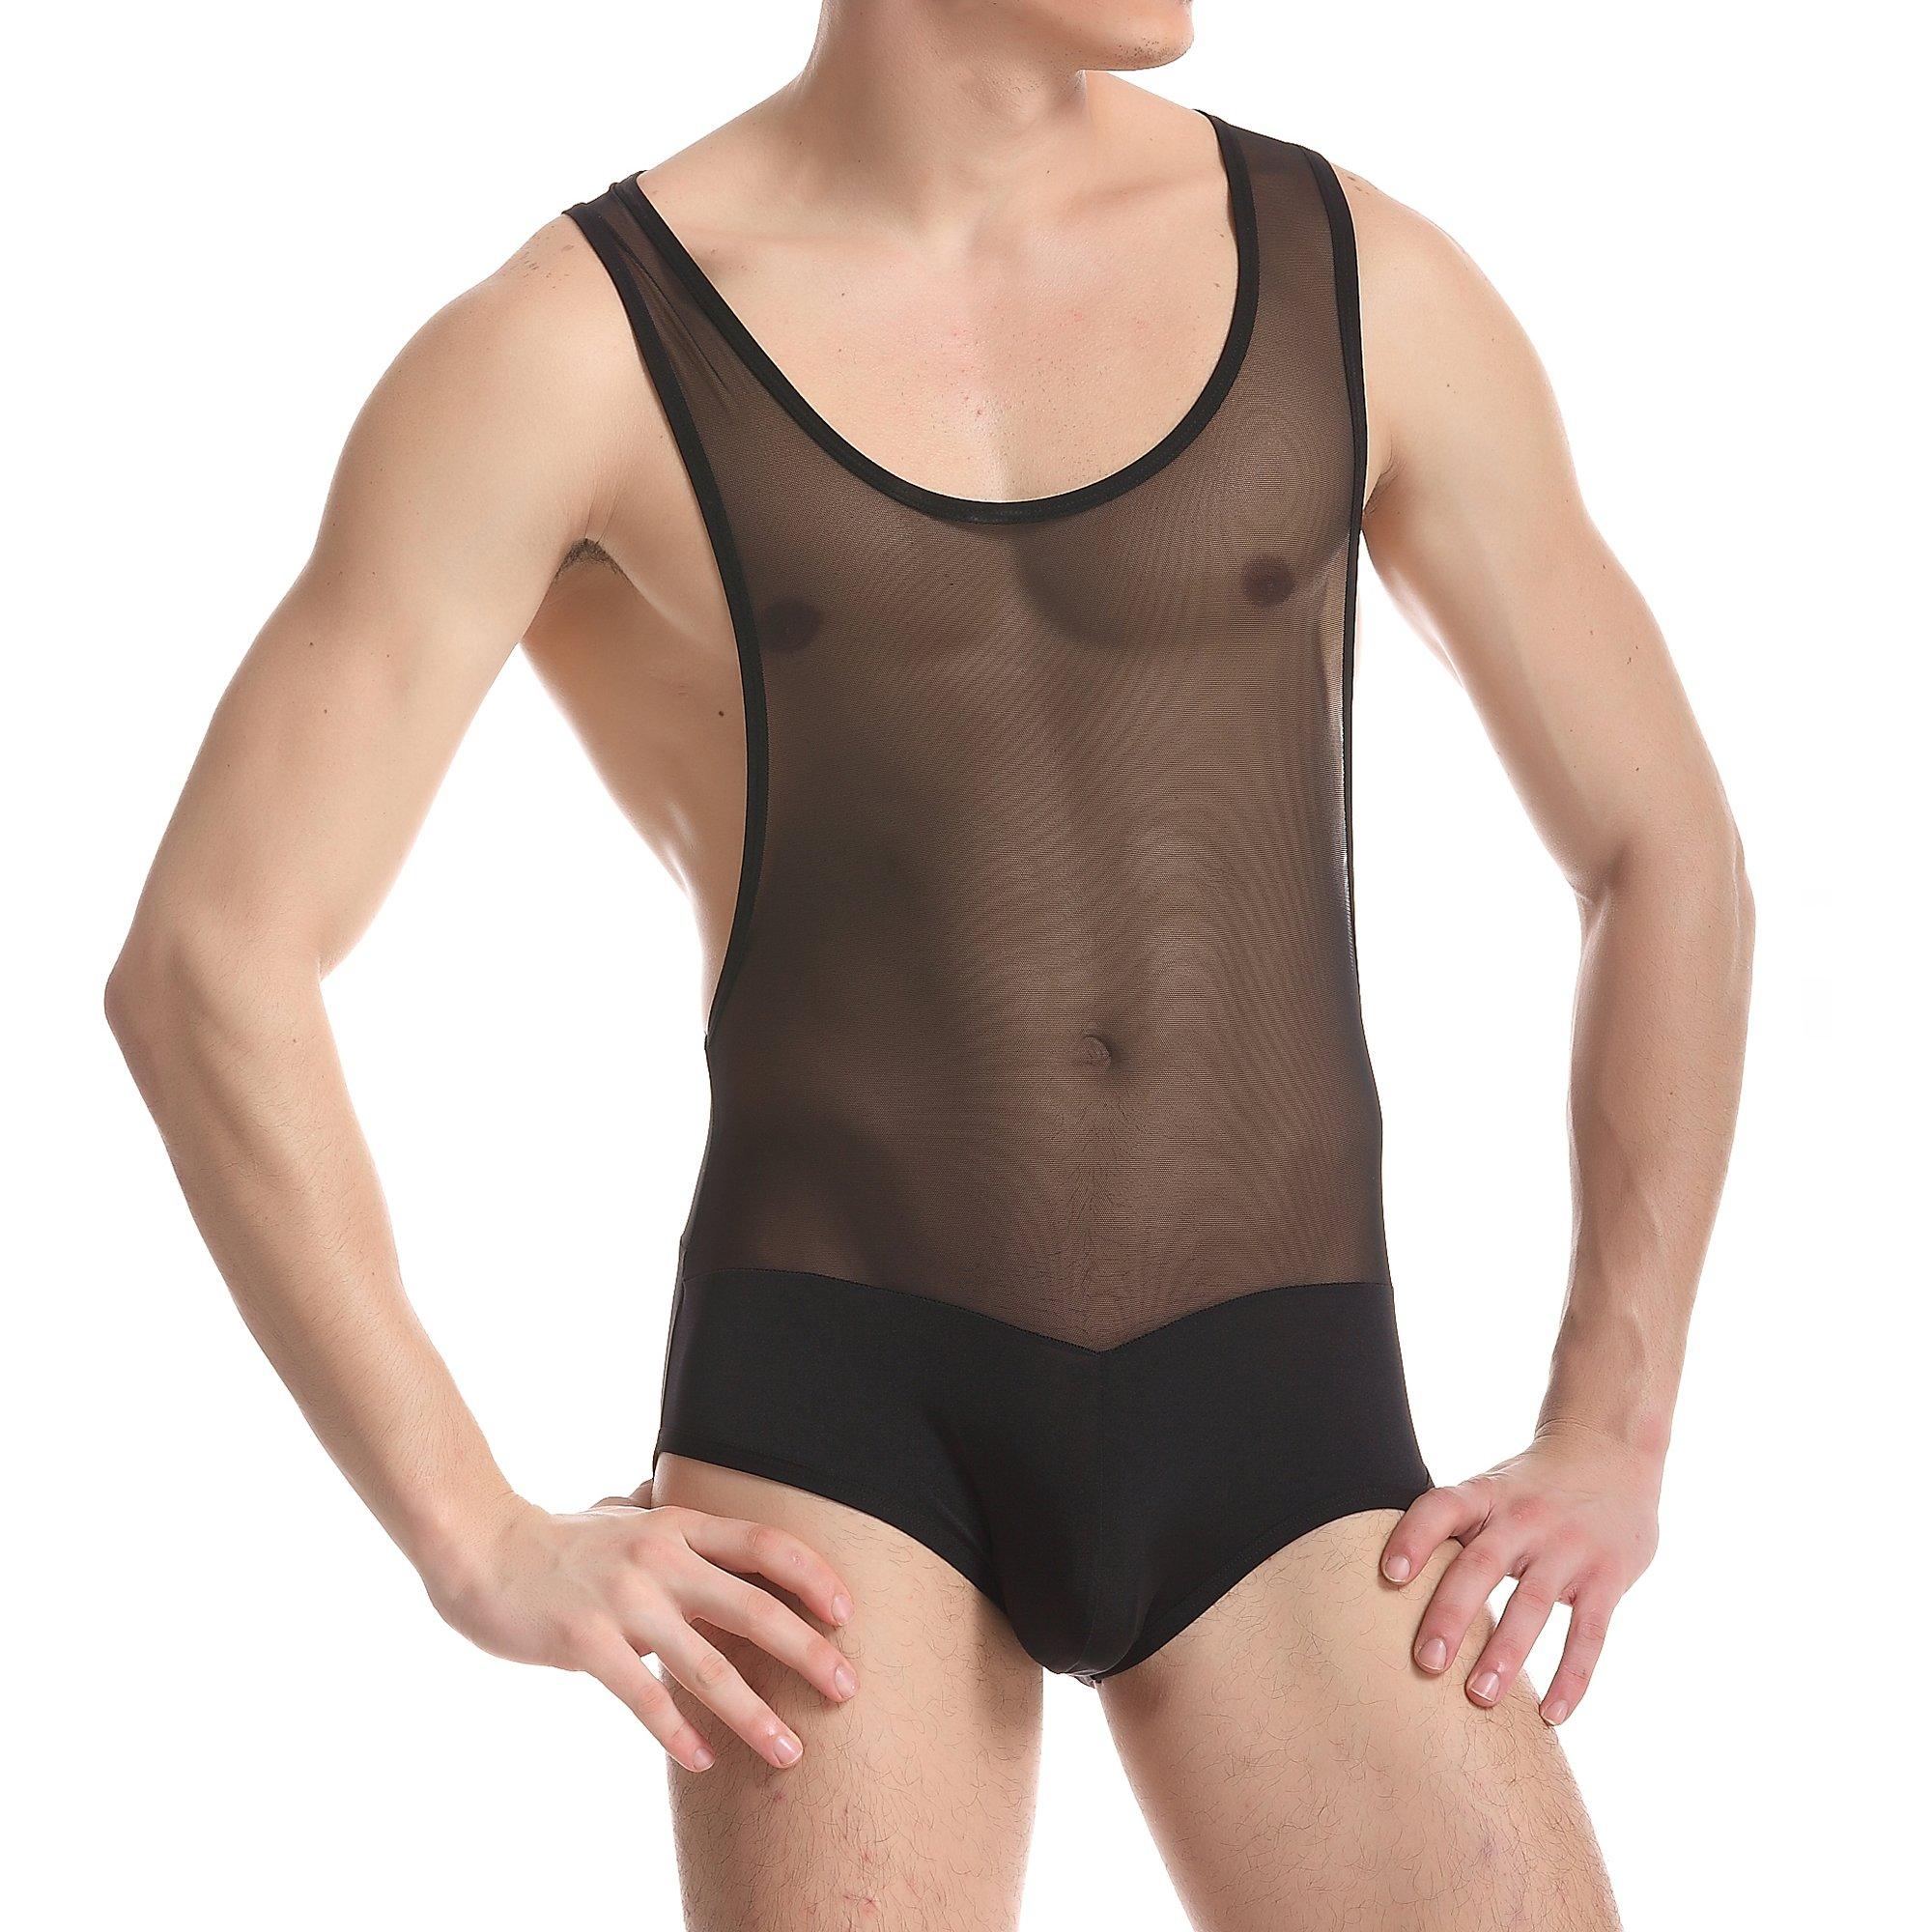 ONEFIT Men's Mesh Jockstrap Bodysuit Leotard Wrestling Singlet Bikini Briefs L by ONEFIT